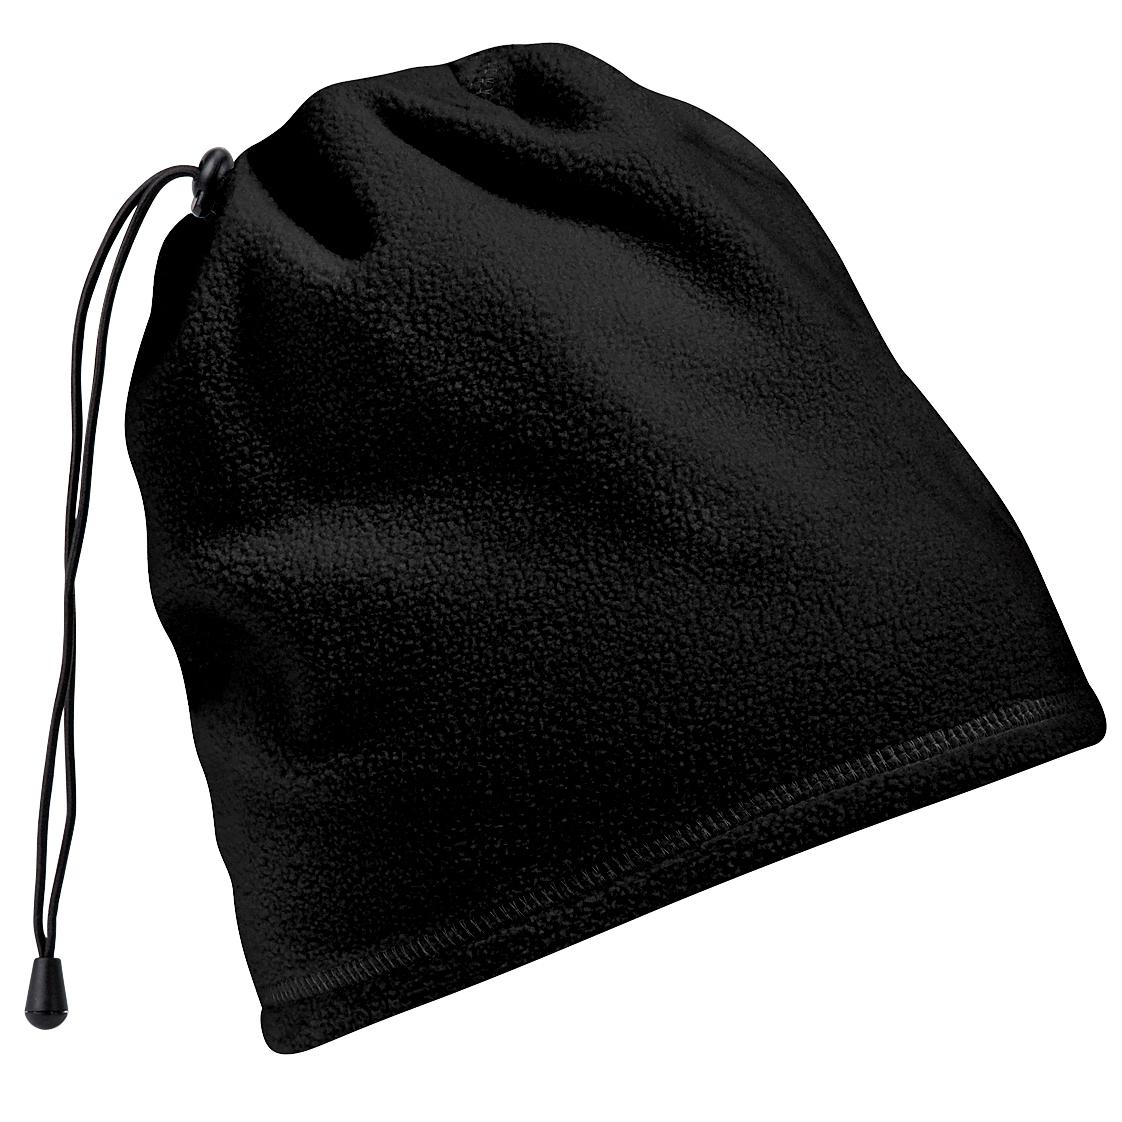 Beechfield Unisex Suprafleece Anti-Pilling 2in1 Winter Hat And Neck Warmer/Snood (One Size) (Black)